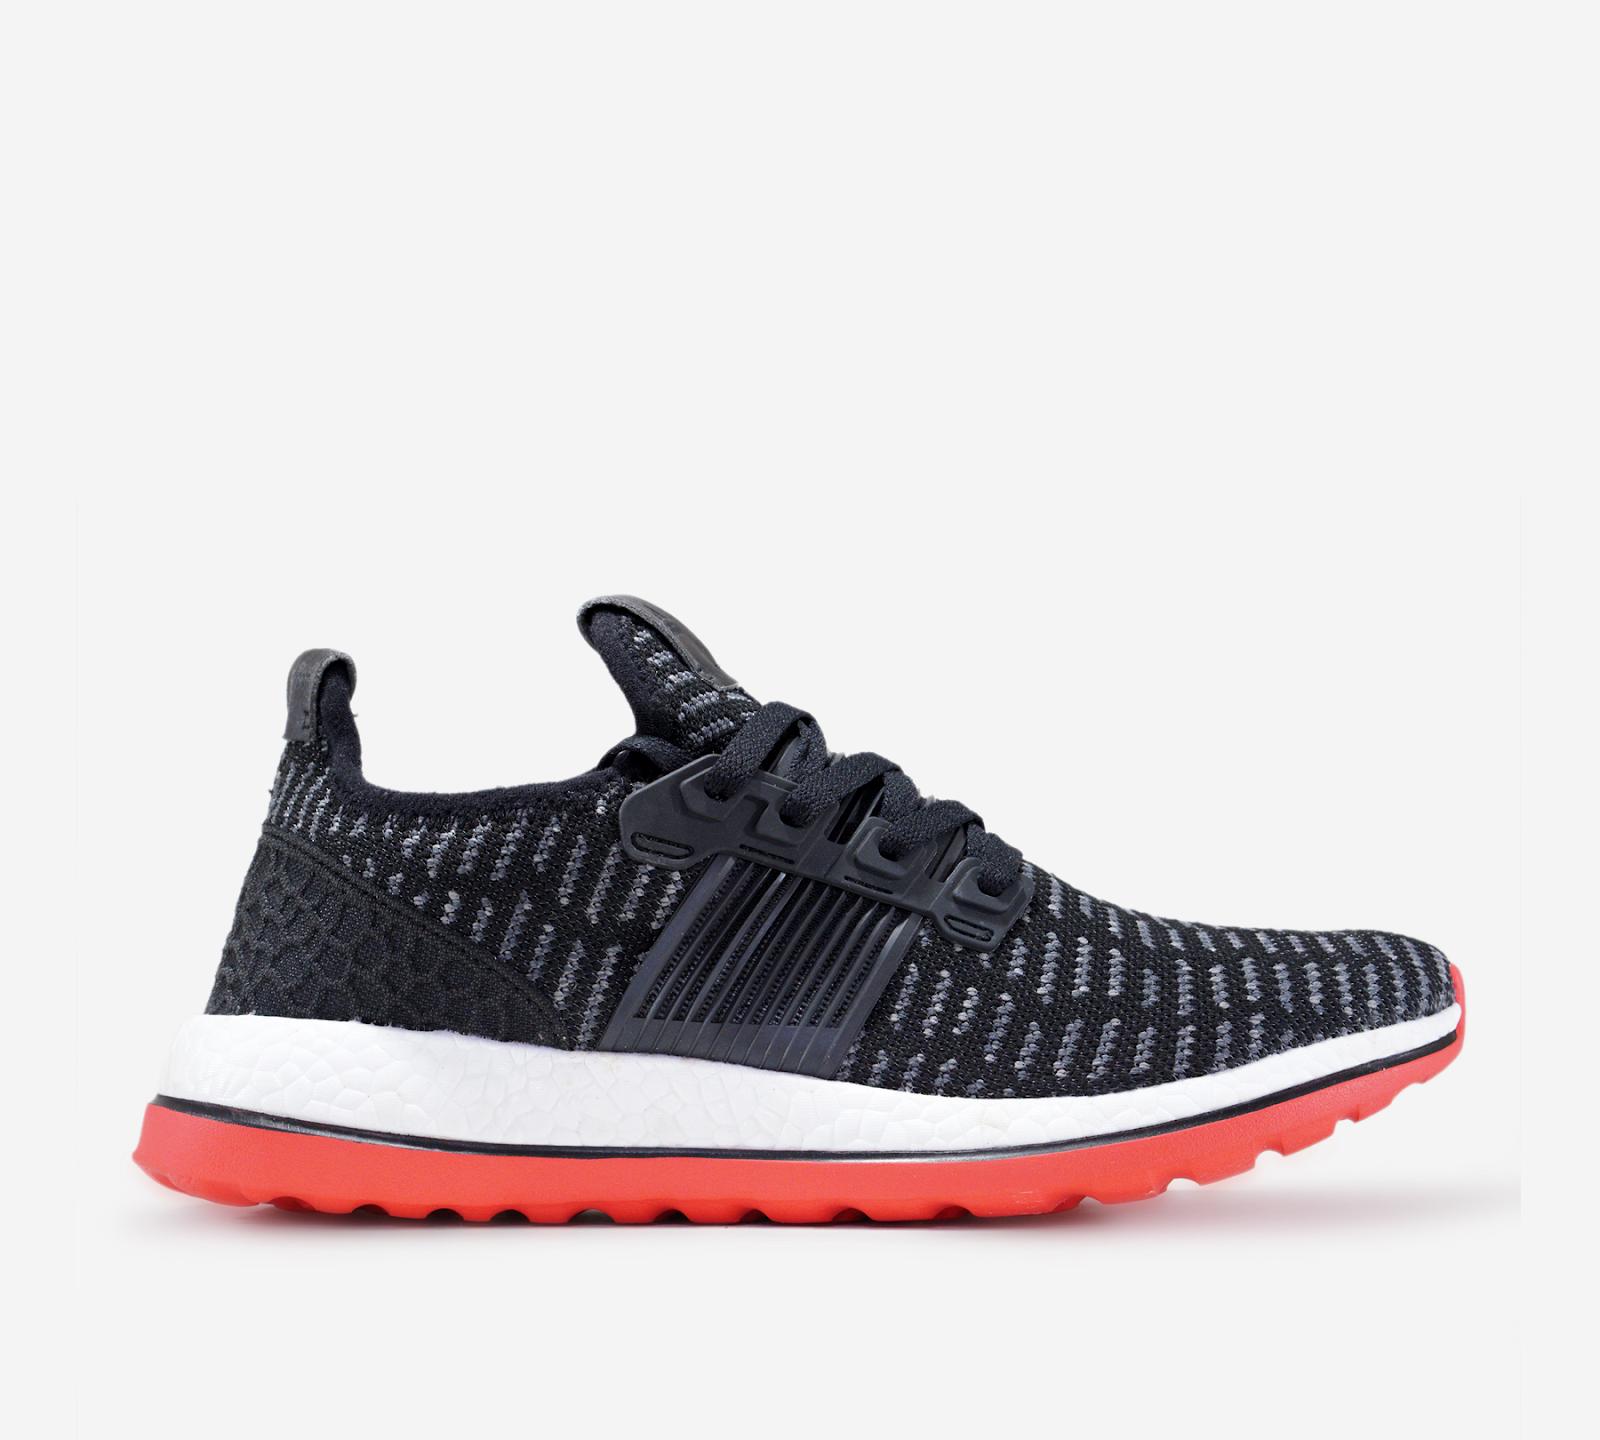 Adidas Pure Boost ZG